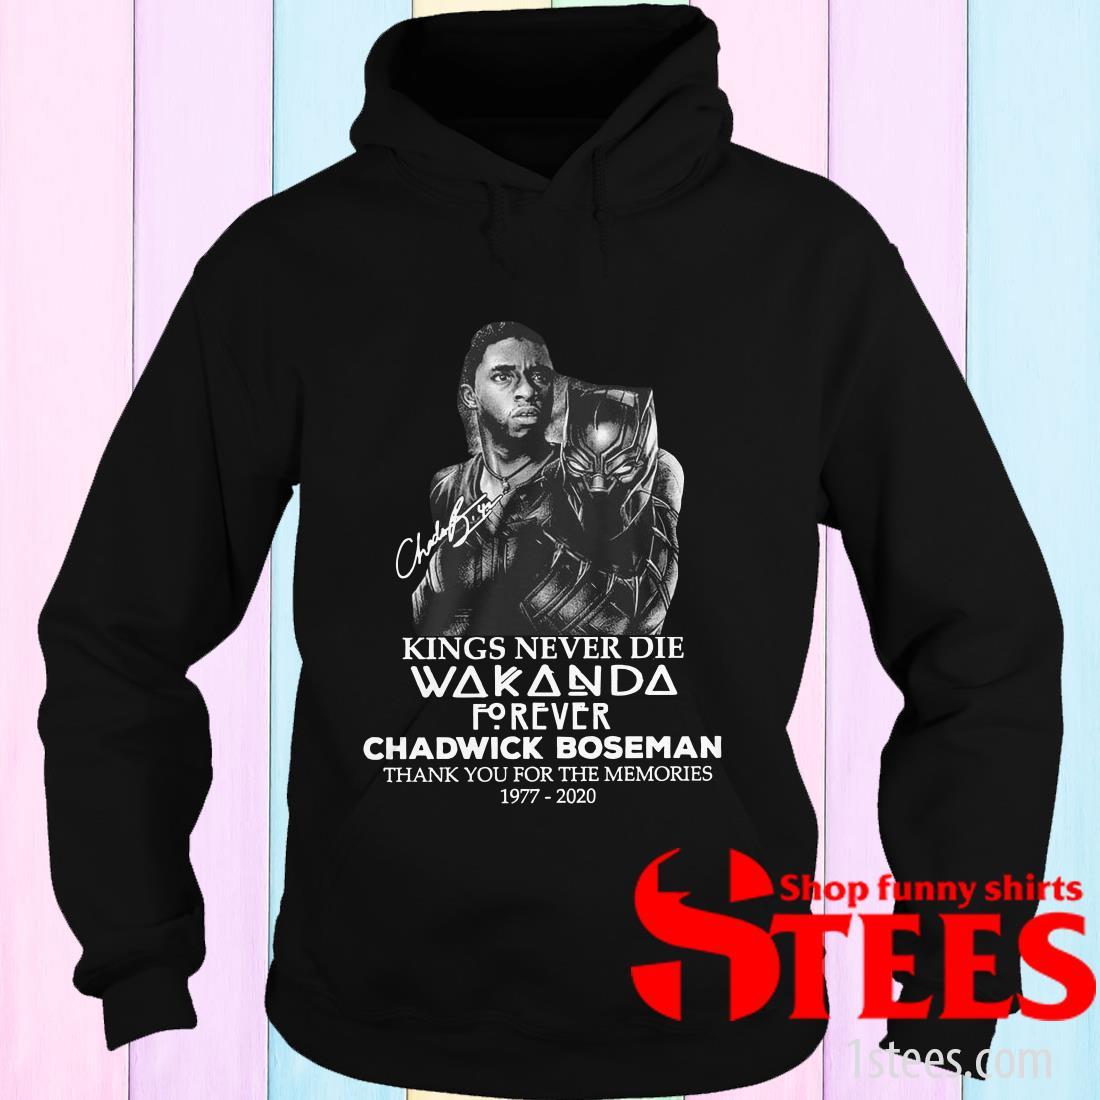 Kings Never Die Wakanda Forever Chadwick Boseman Thank You For The Memories 1977-2020 Hoodies